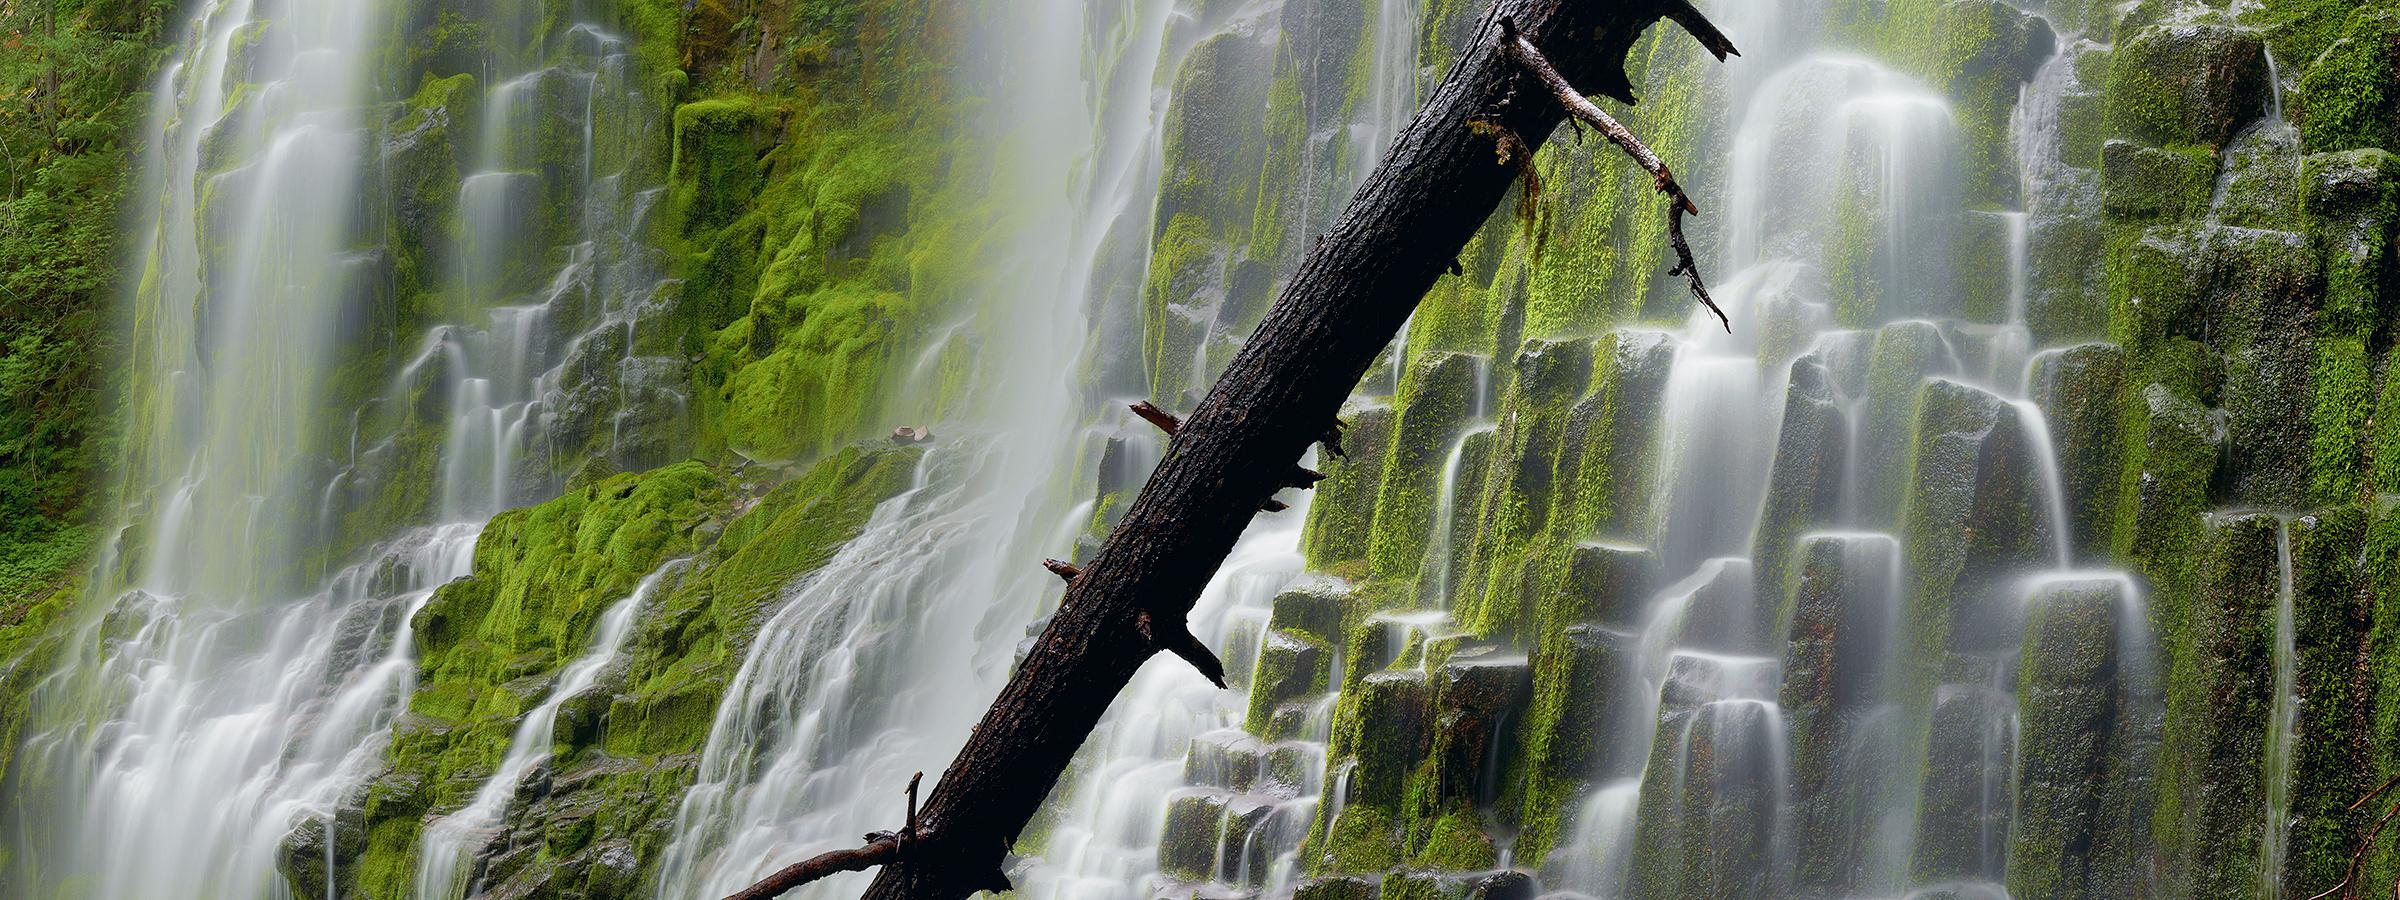 Top of the Falls to Ya.jpg